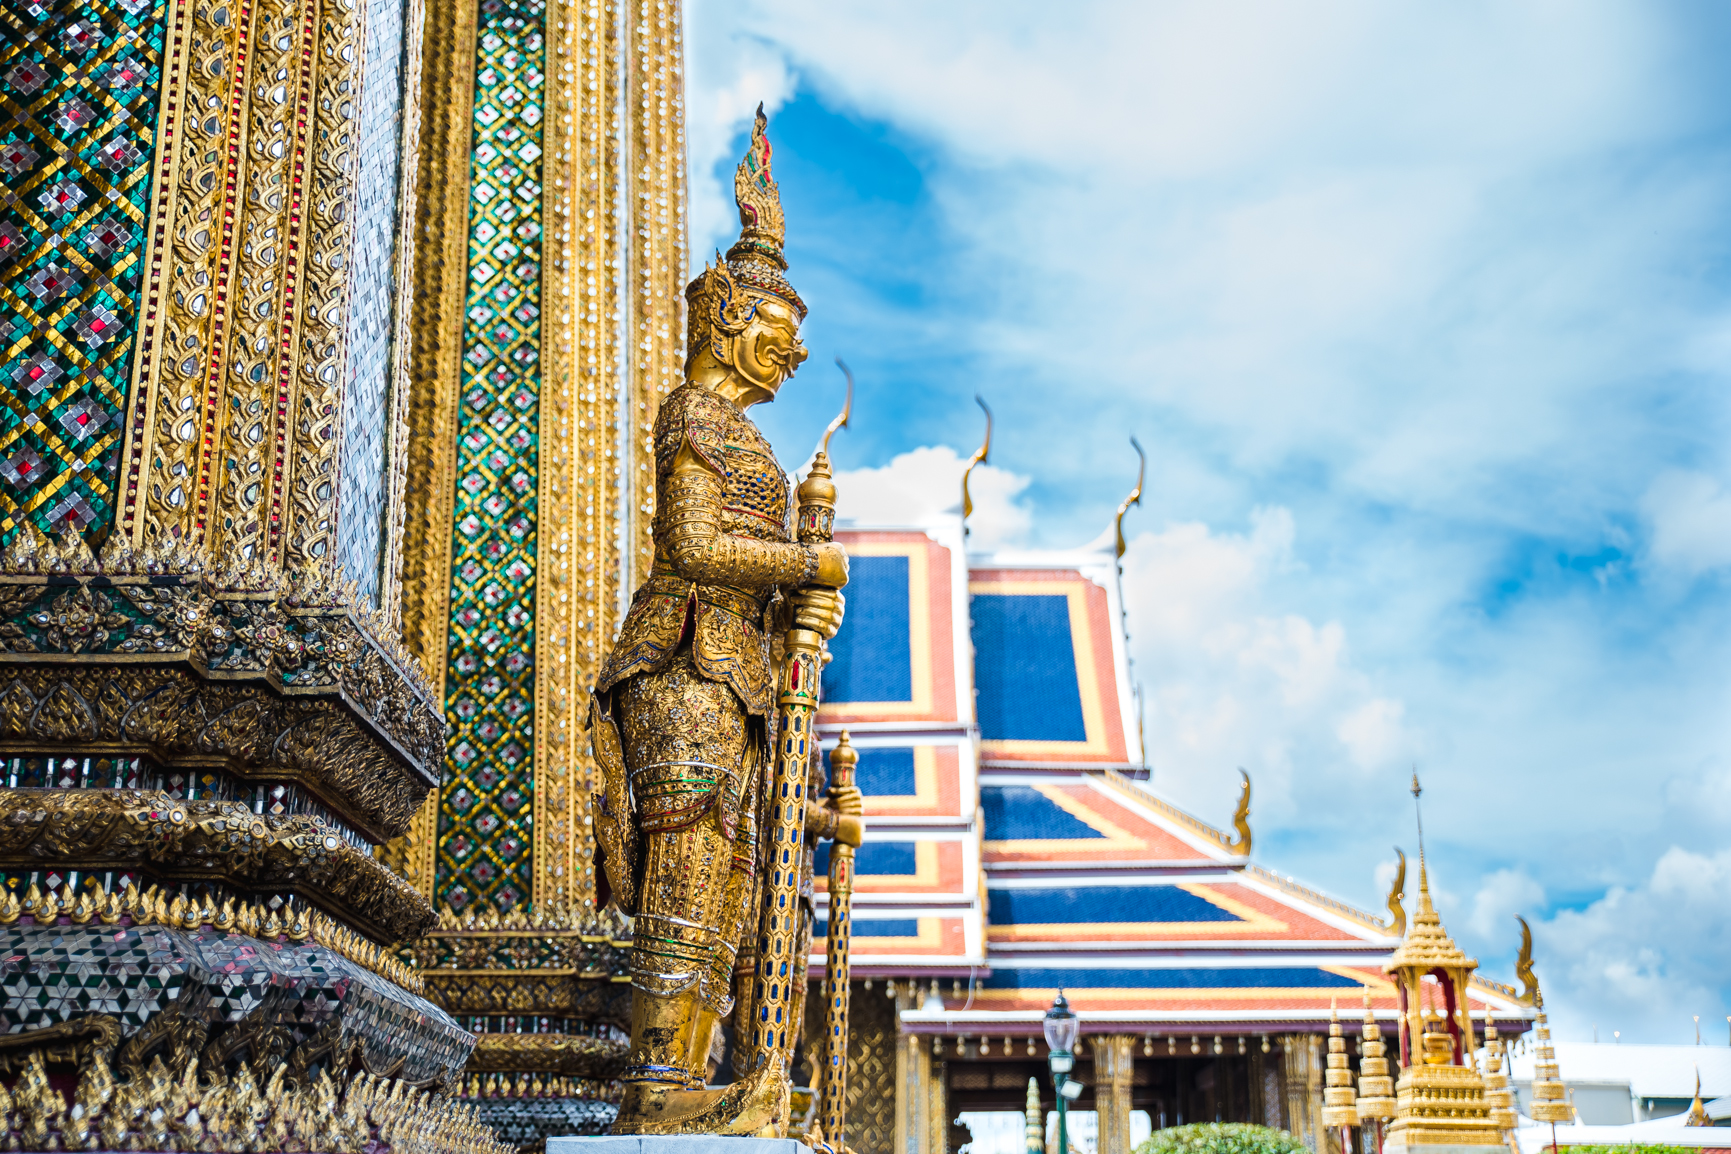 Ibrahim Badru Thailand eyeobee ART The Wandering eye_-8.jpg